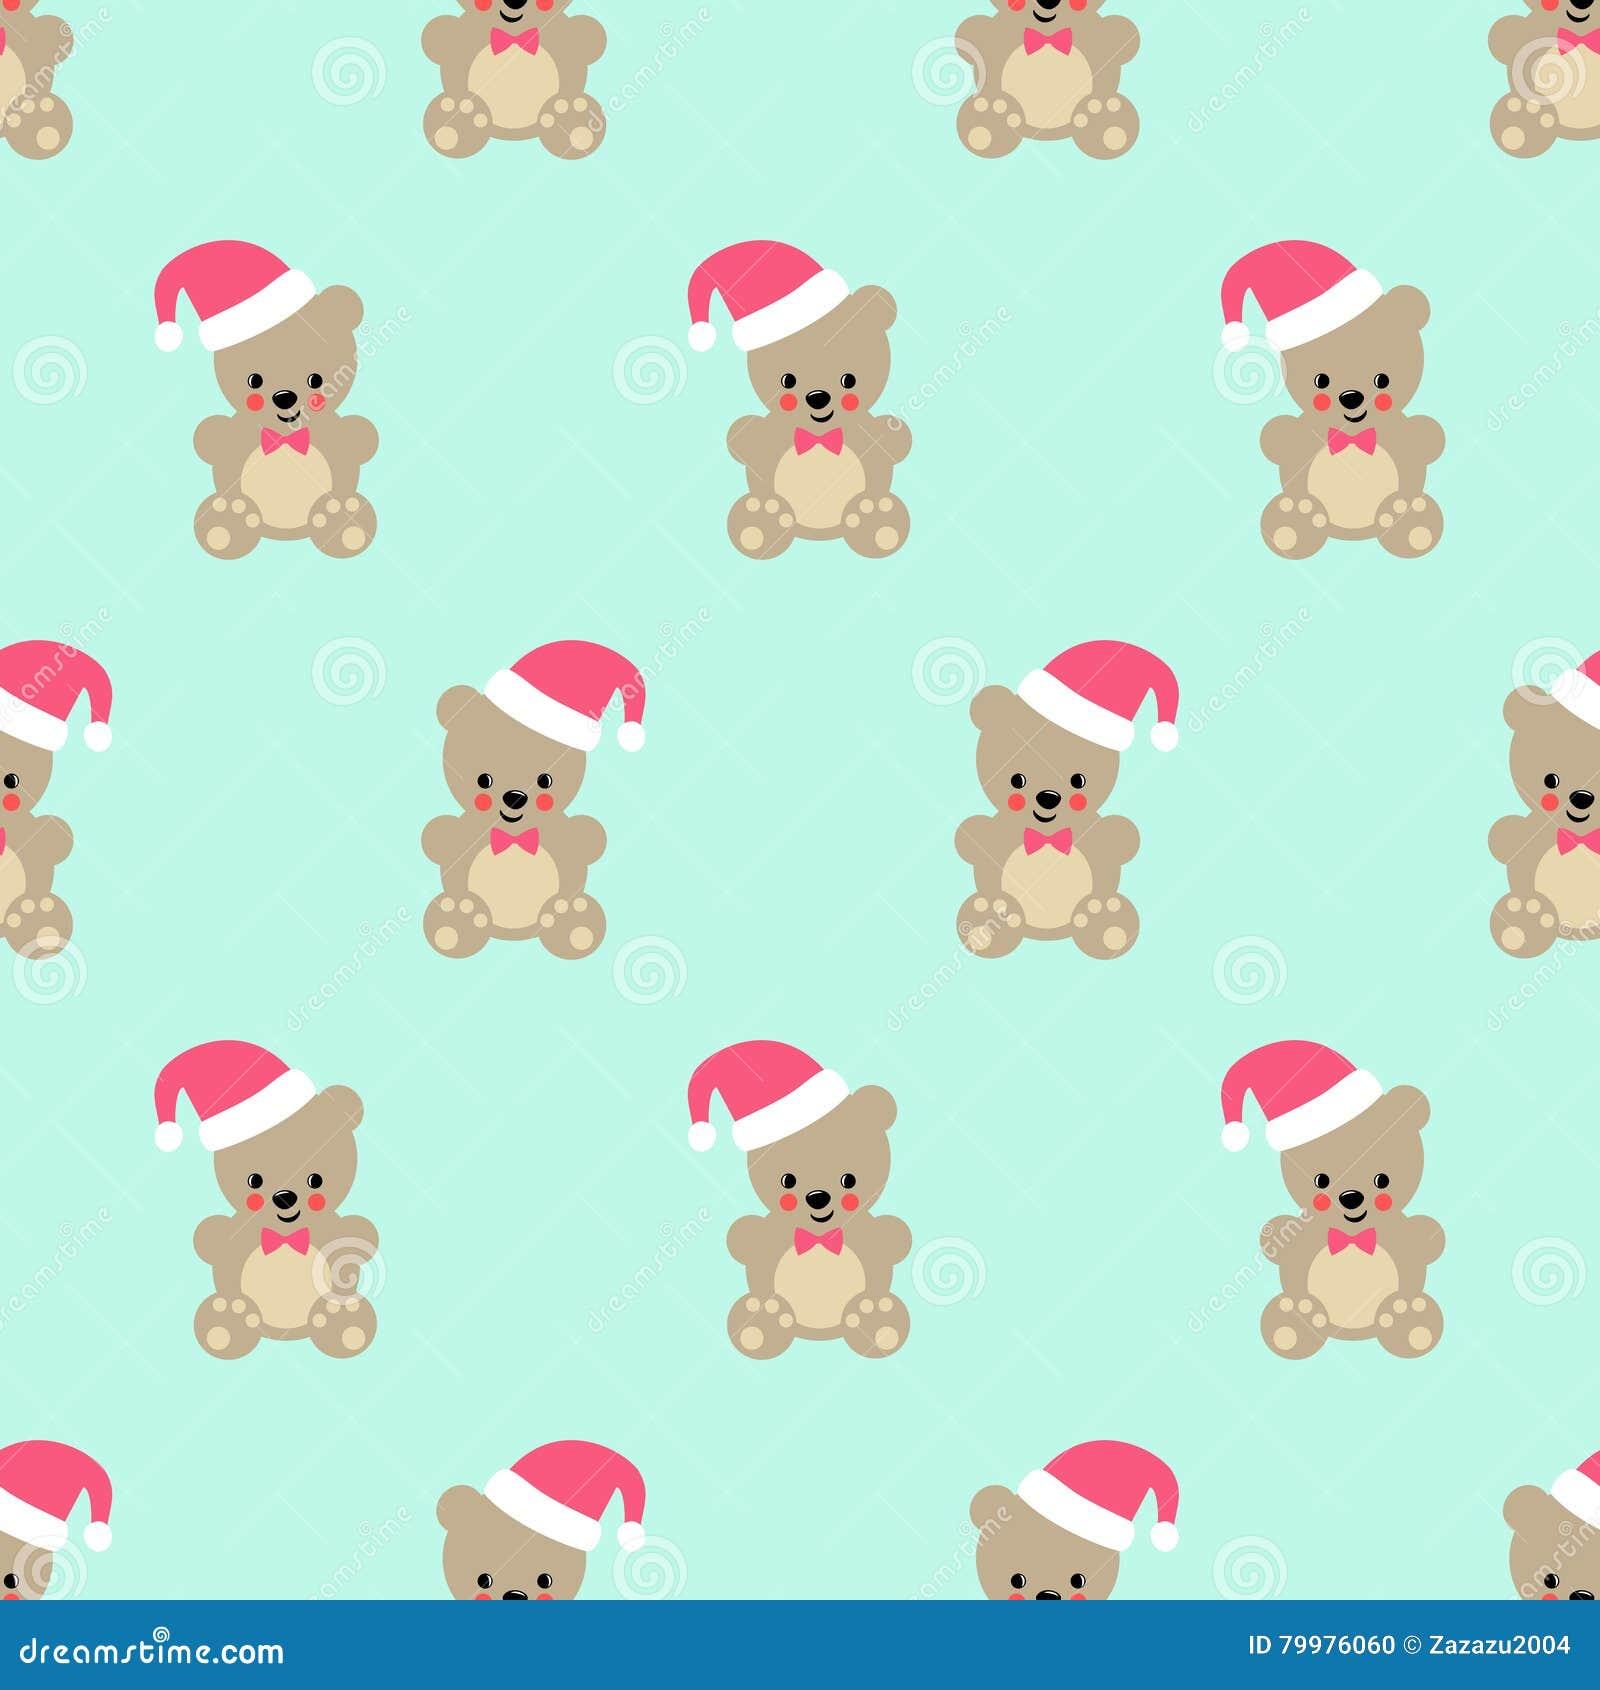 Teddy Bear With Santa Hat Seamless Pattern Stock Vector